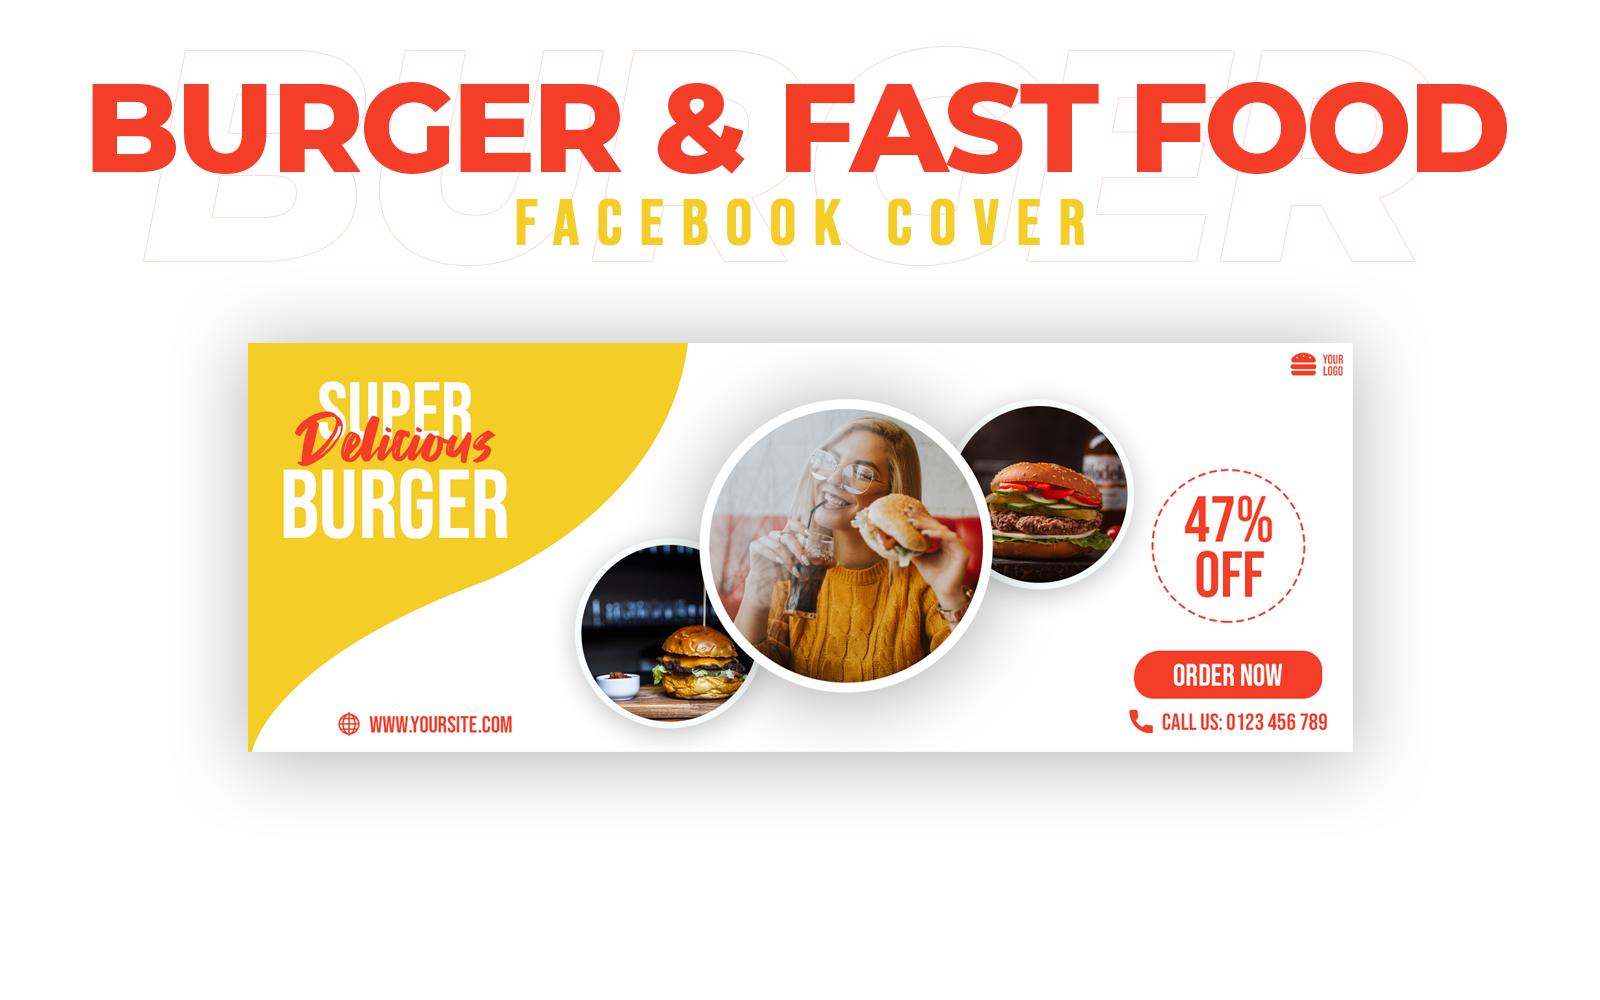 Burger & Fast Food Facebook Cover Social Media